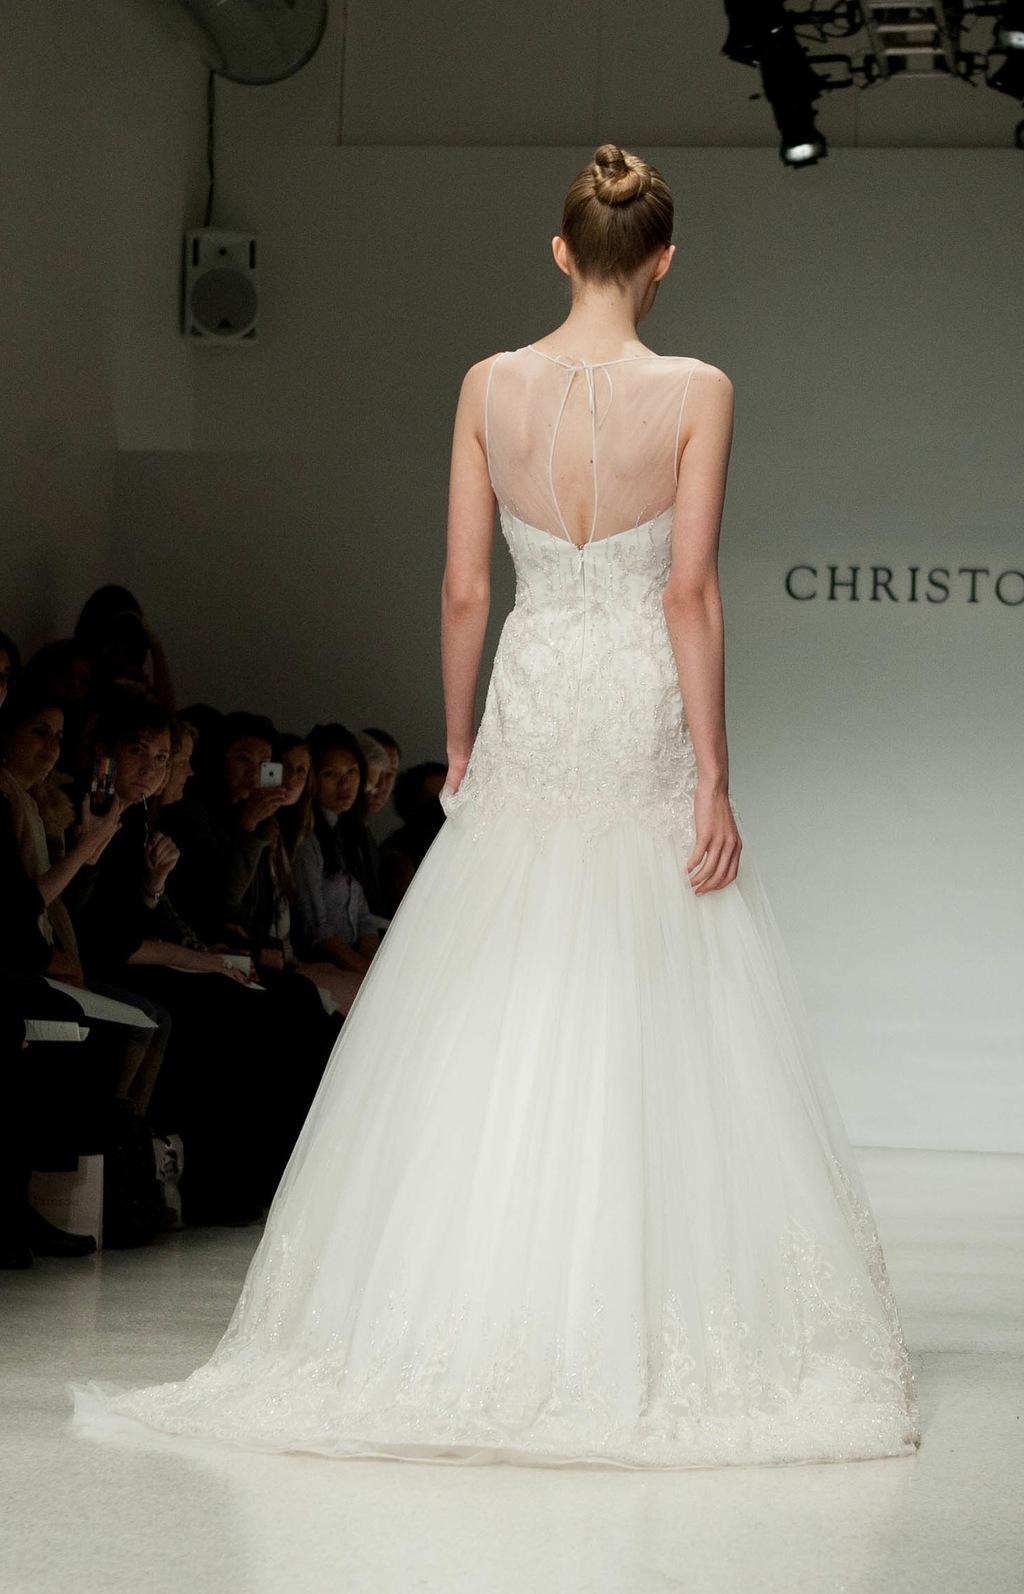 2012_wedding_dress_christos_bridal_gowns_0523_back.full